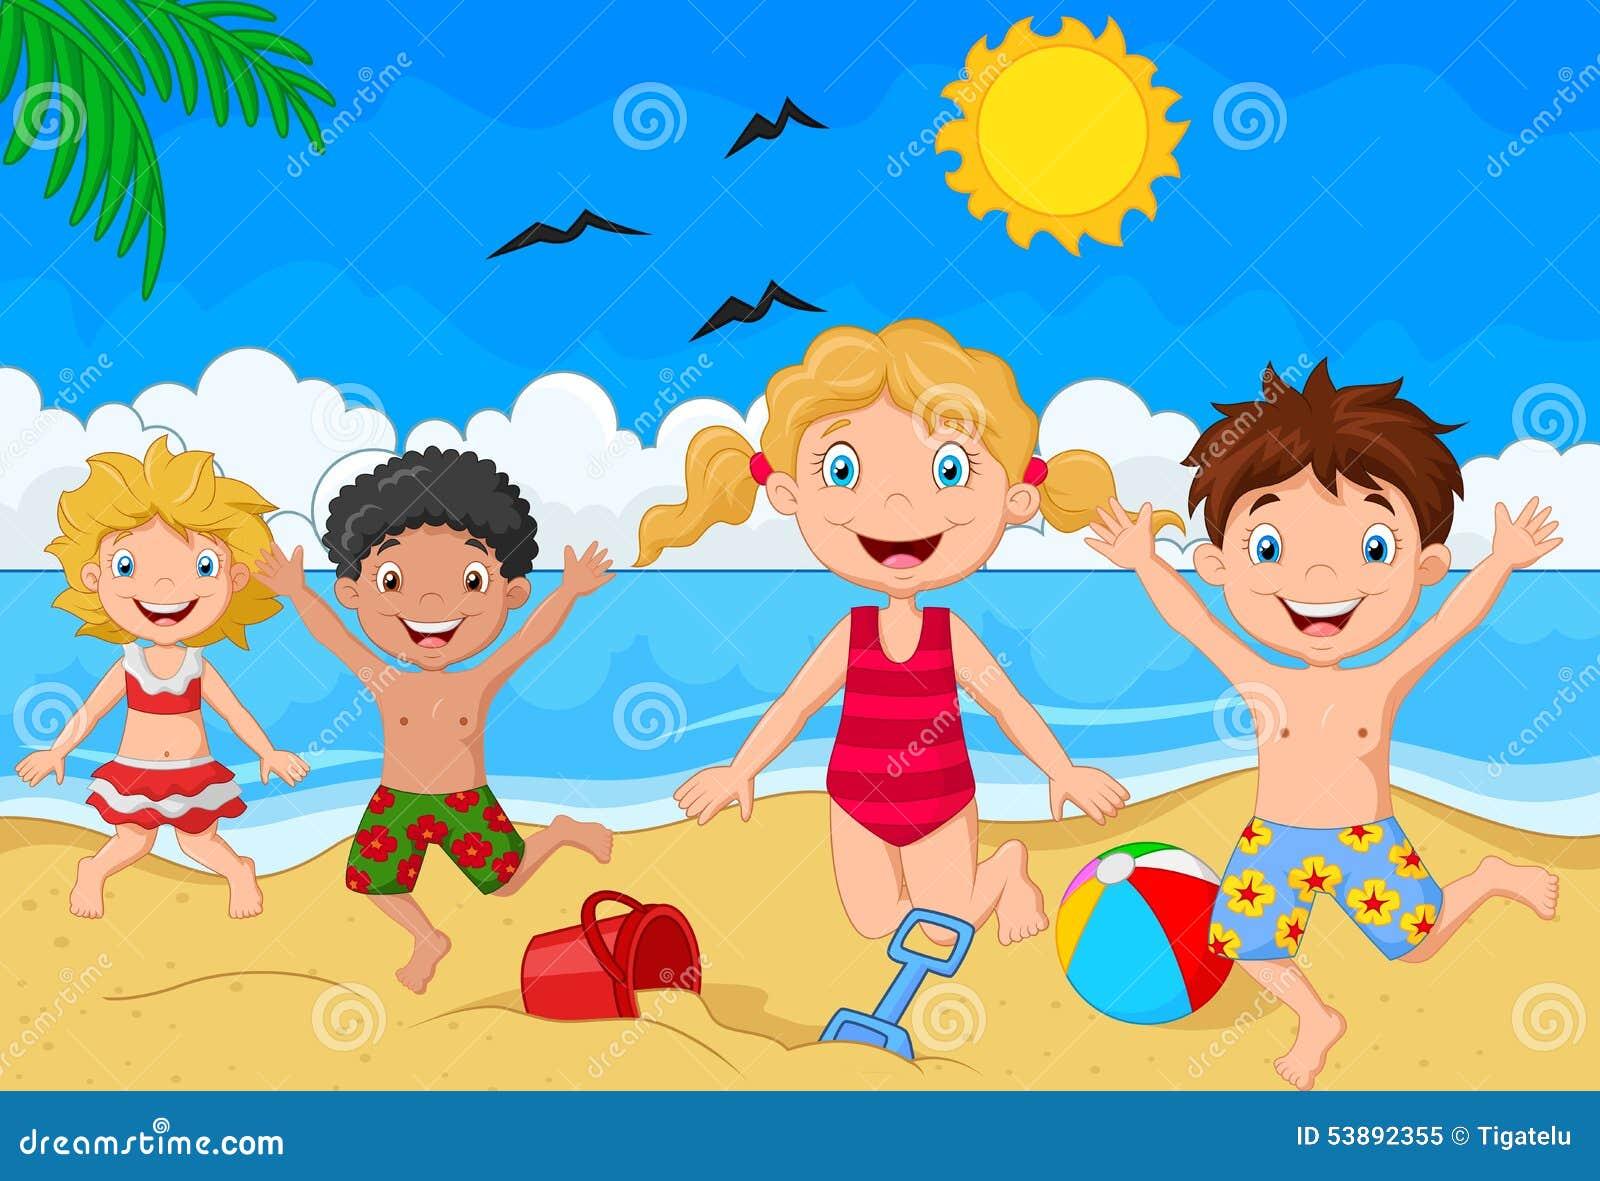 Vegetable garden kids drawing - Cartoon Summer Day Stock Vector Image 53892355